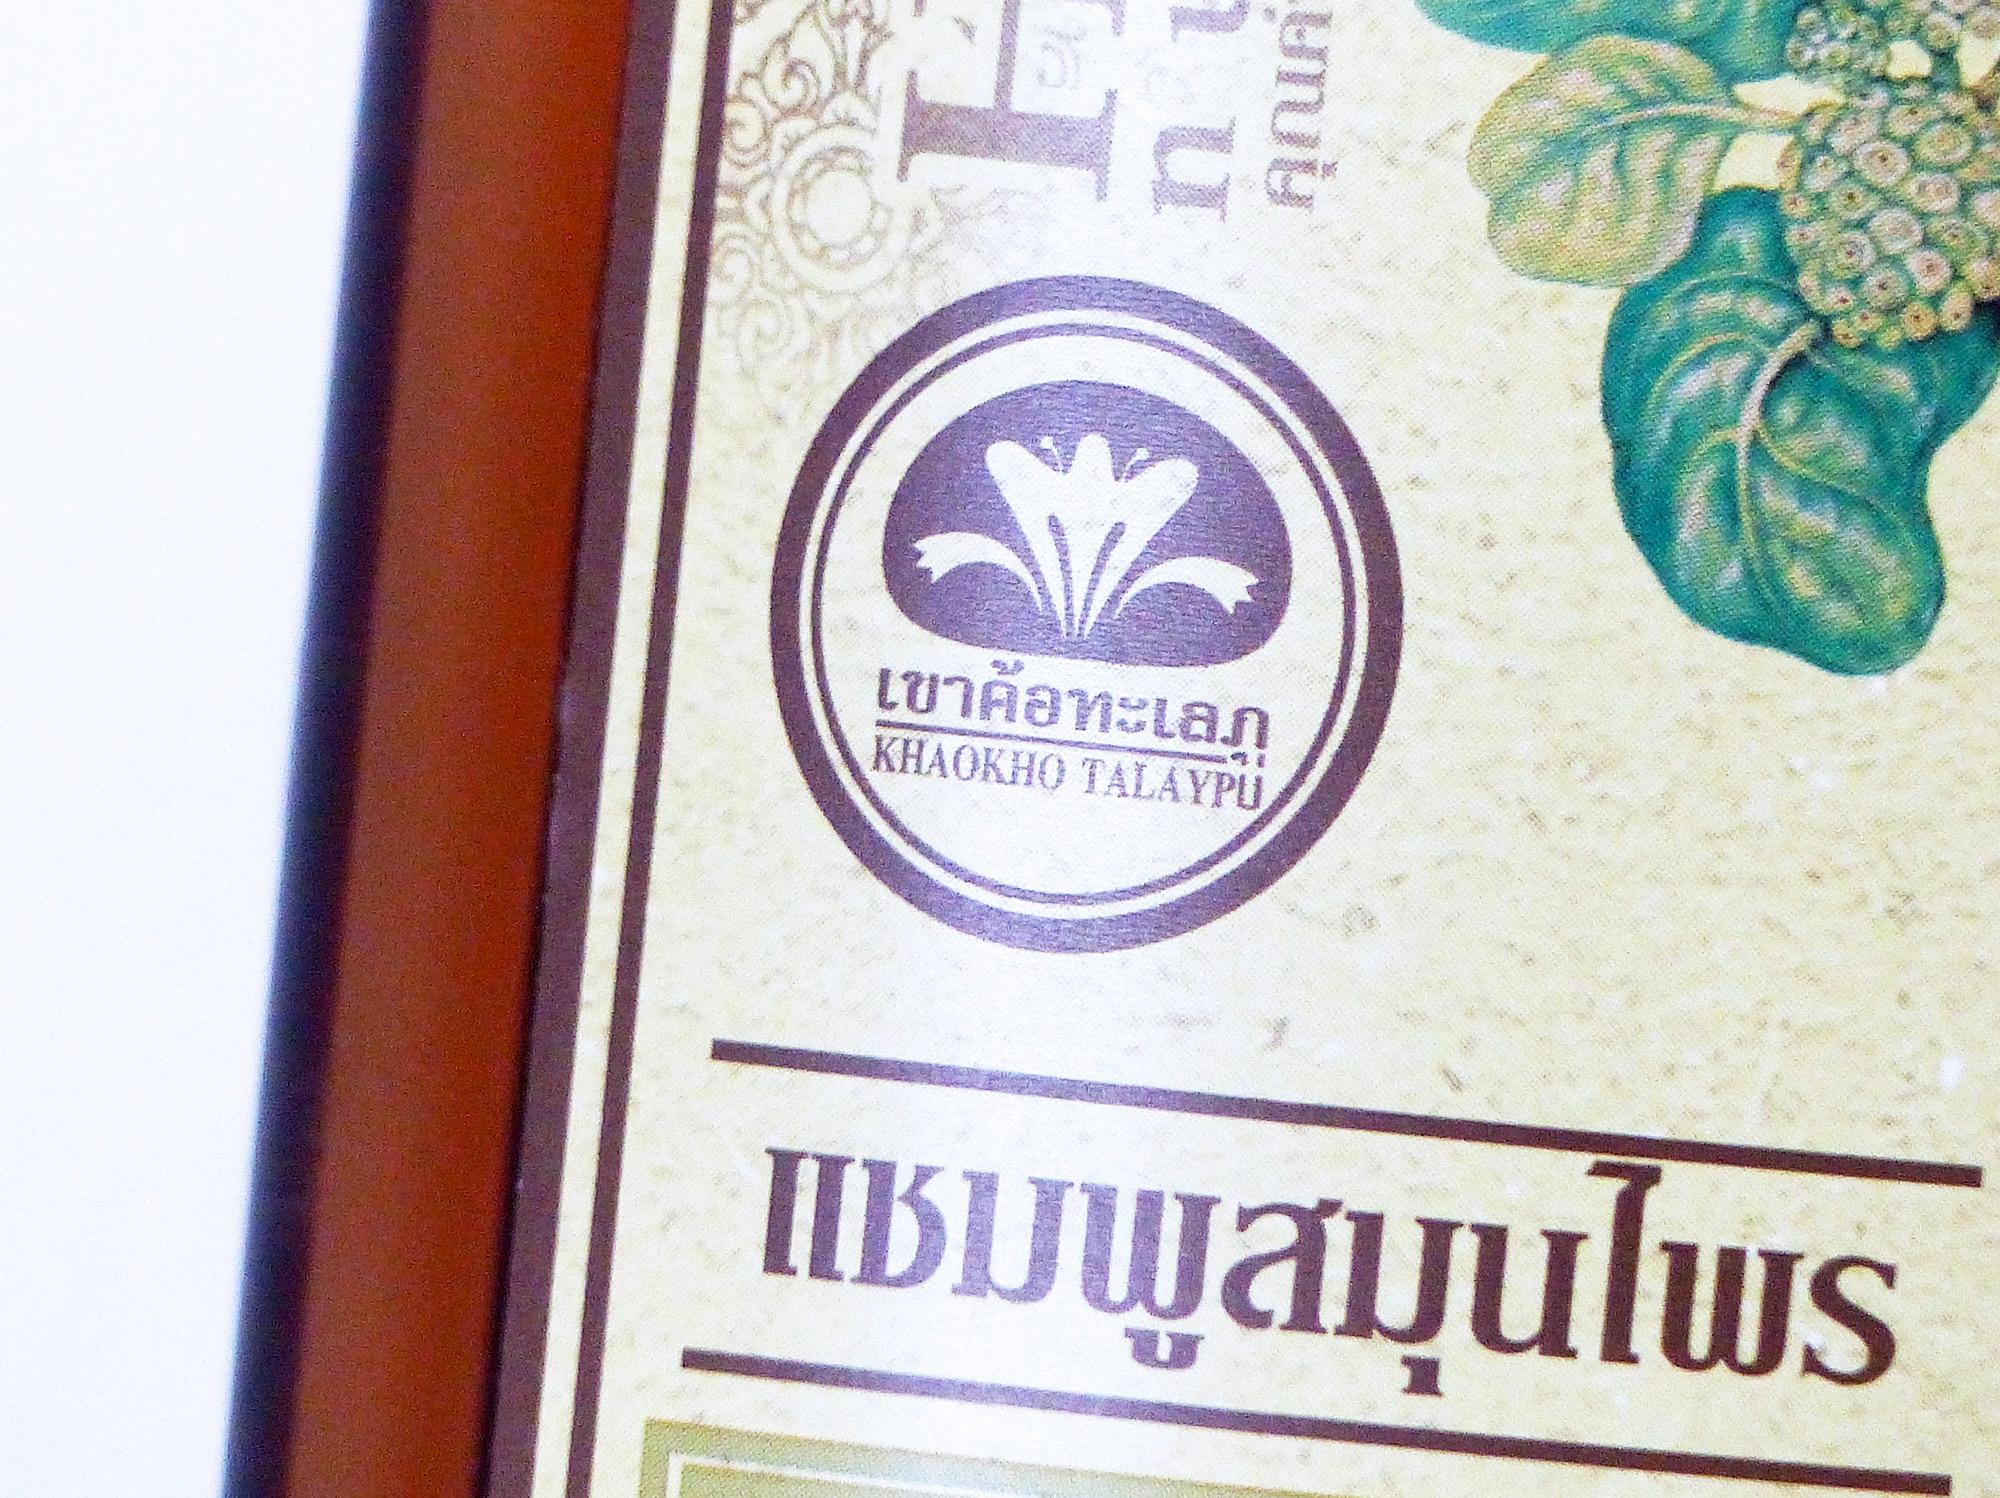 Noni Herbal Hait shampoo de la marque Khaokho Talaypu - Autour de Marine